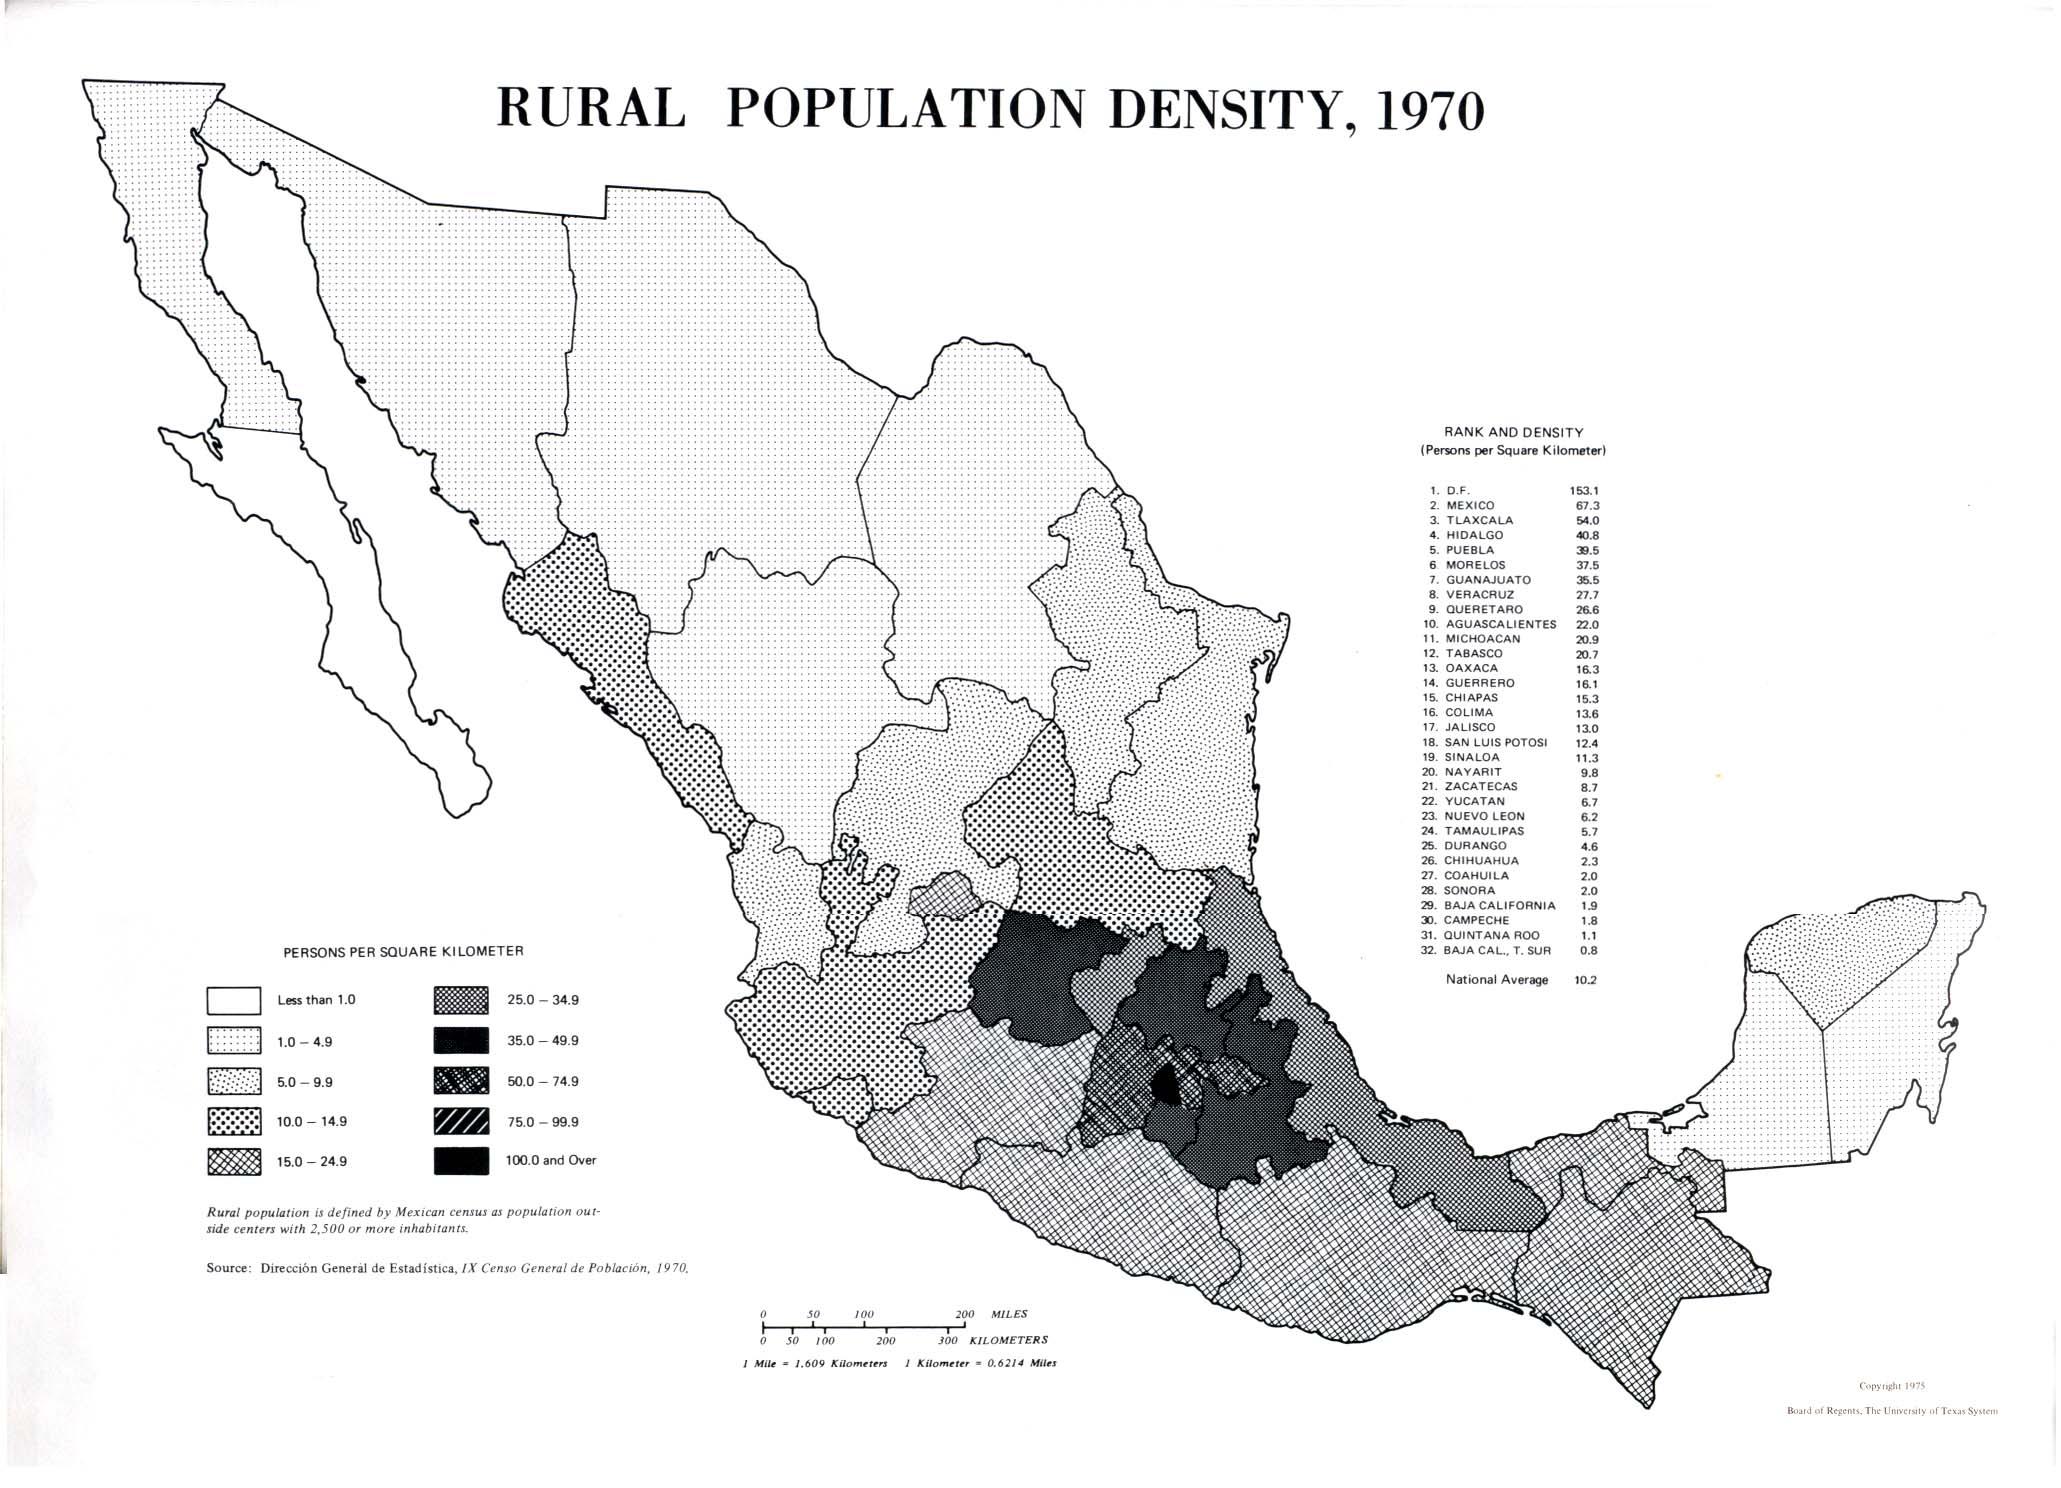 Mapa de Densidad de Población Rural, México 1970